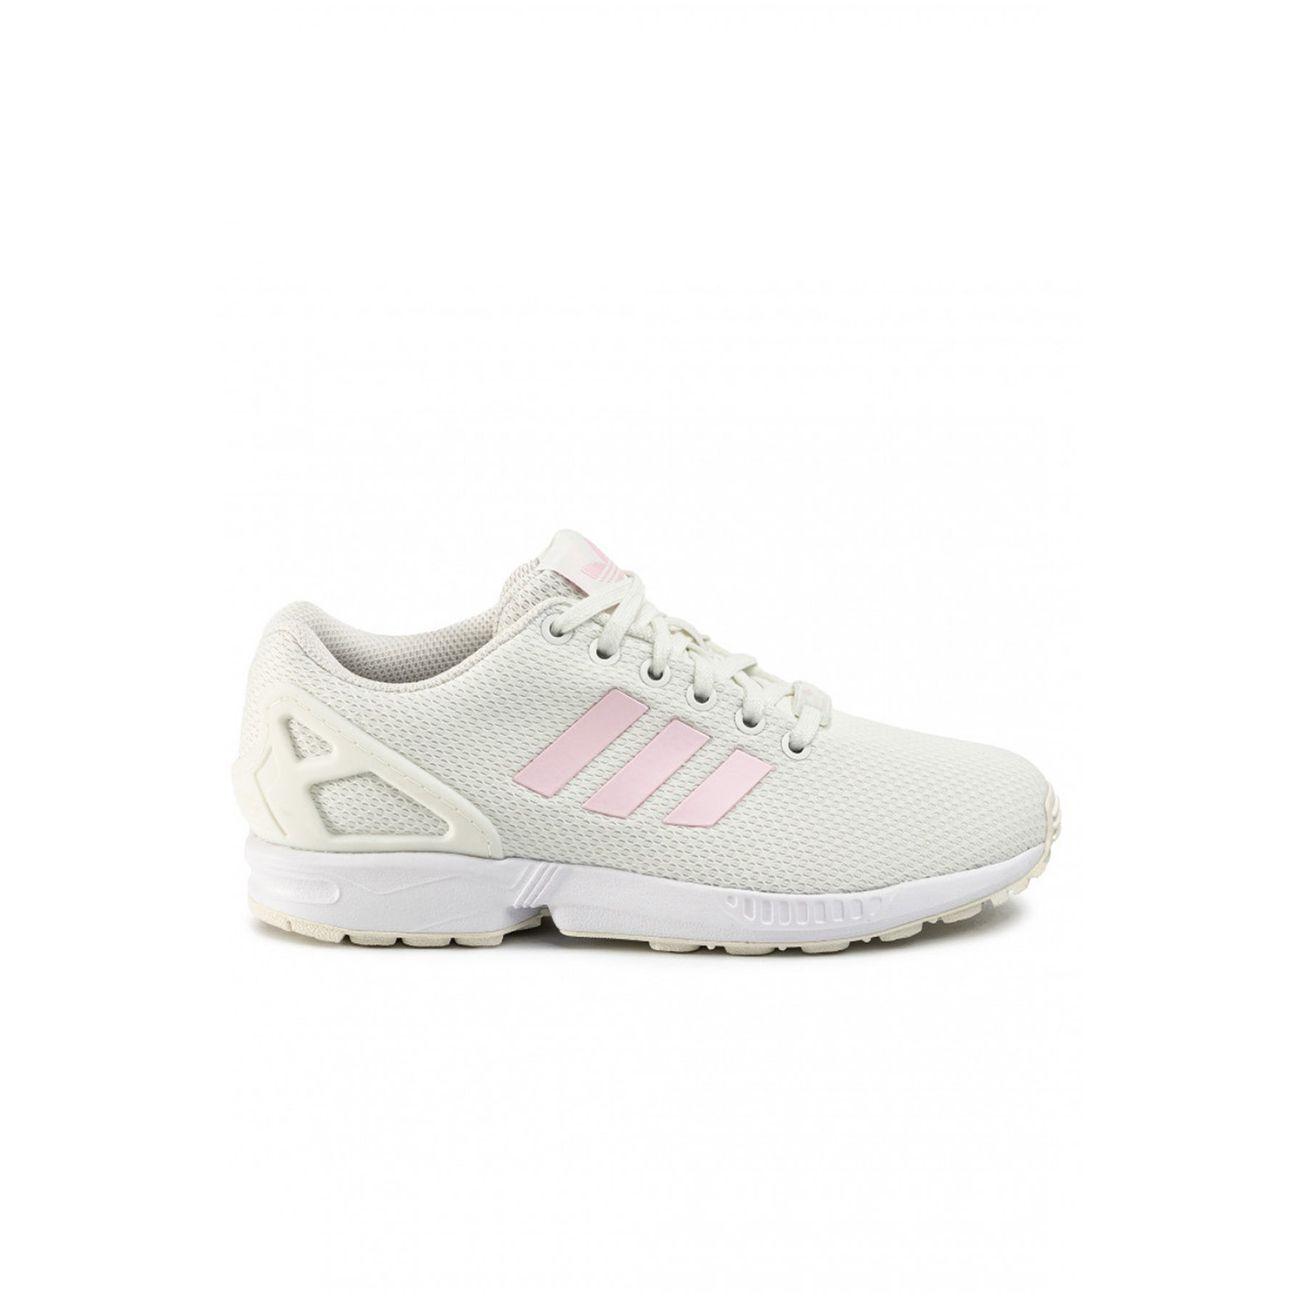 femme ADIDAS Sneaker adidas ZX FLUX W - Adidas - Femme